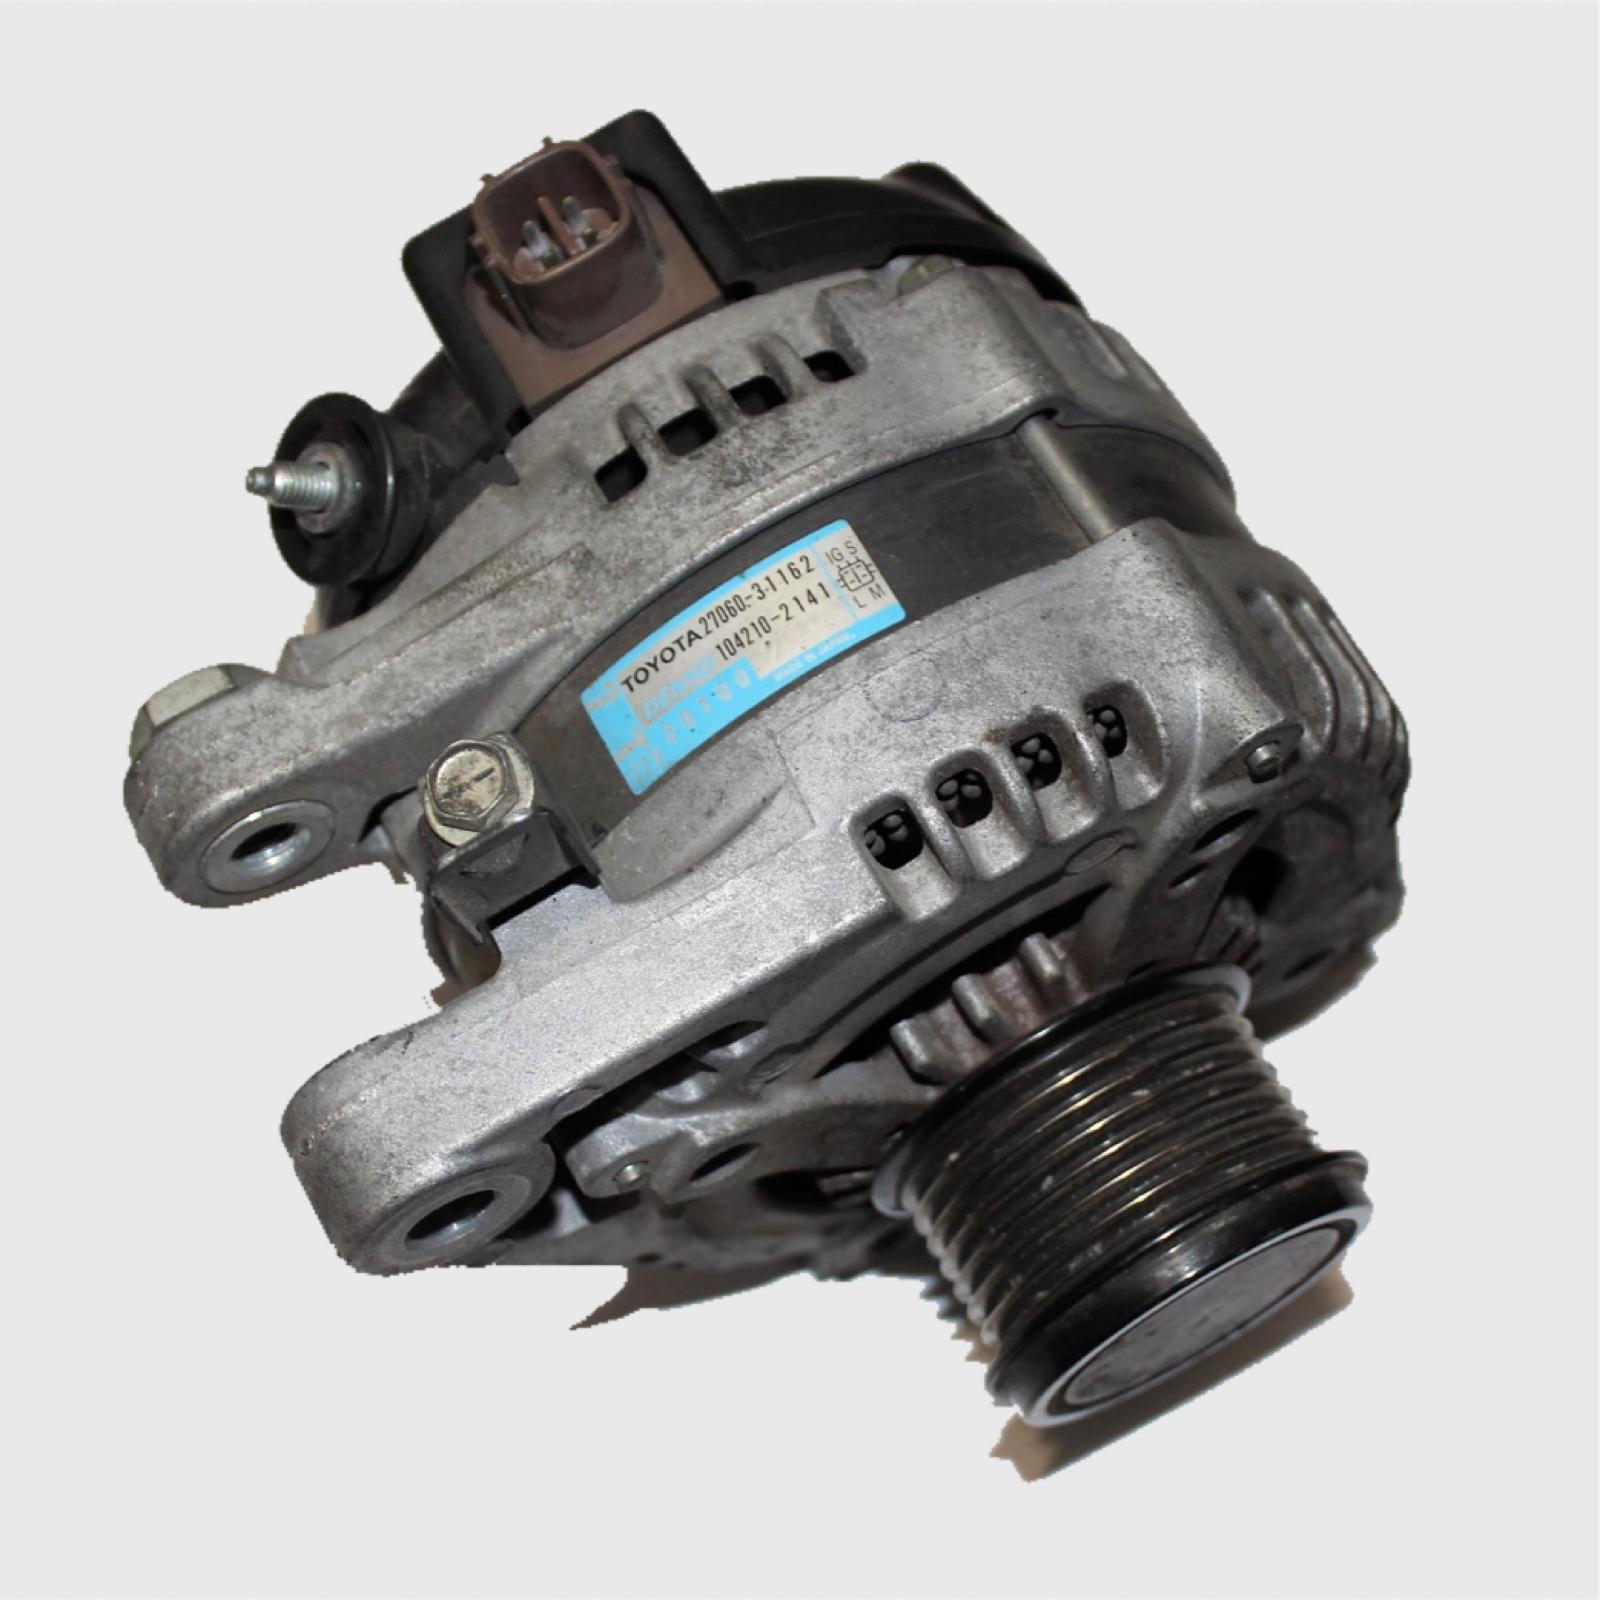 TOYOTA KLUGER, Alternator, 3.5 V6, 2GR-FE, GSU40-GSU45, 08/07-02/14